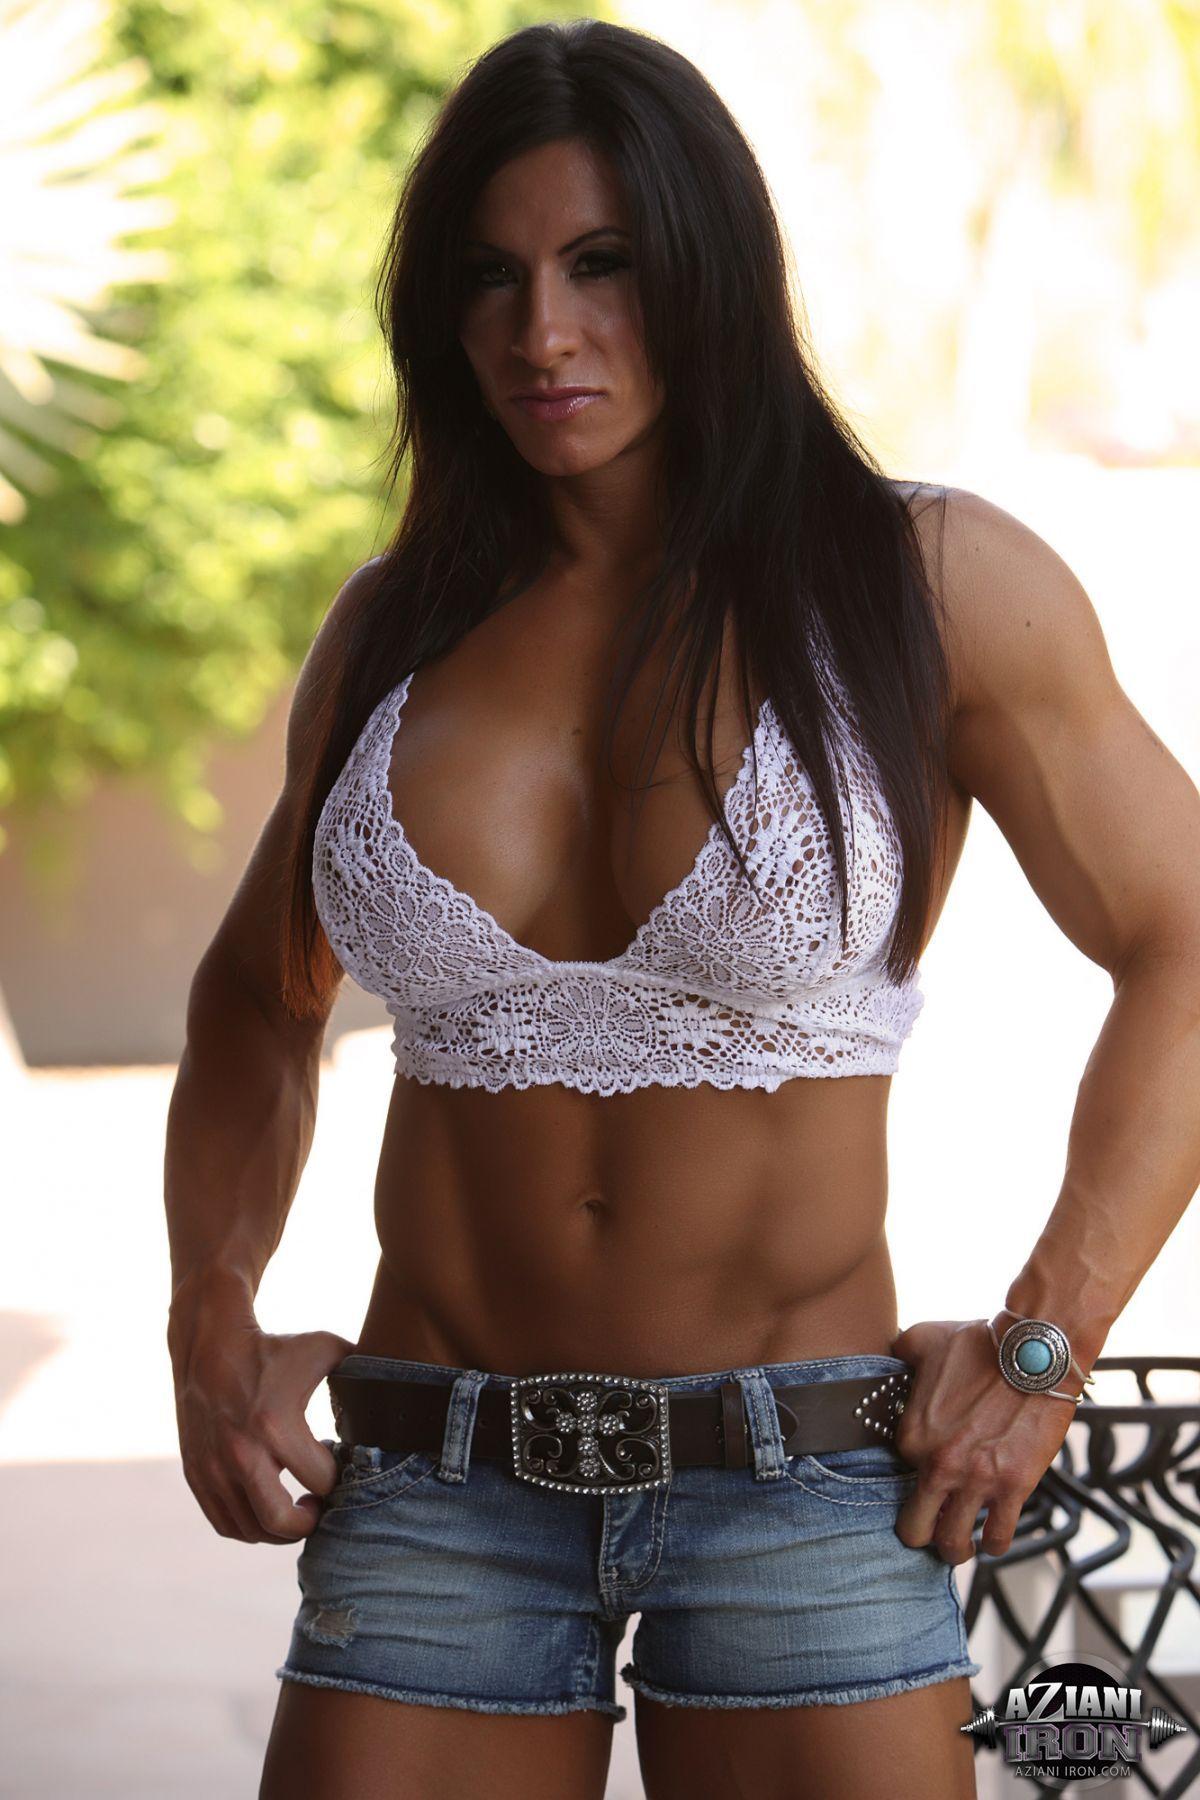 Angela Salvagno Twitter angela salvagno   fit women, power girl, female